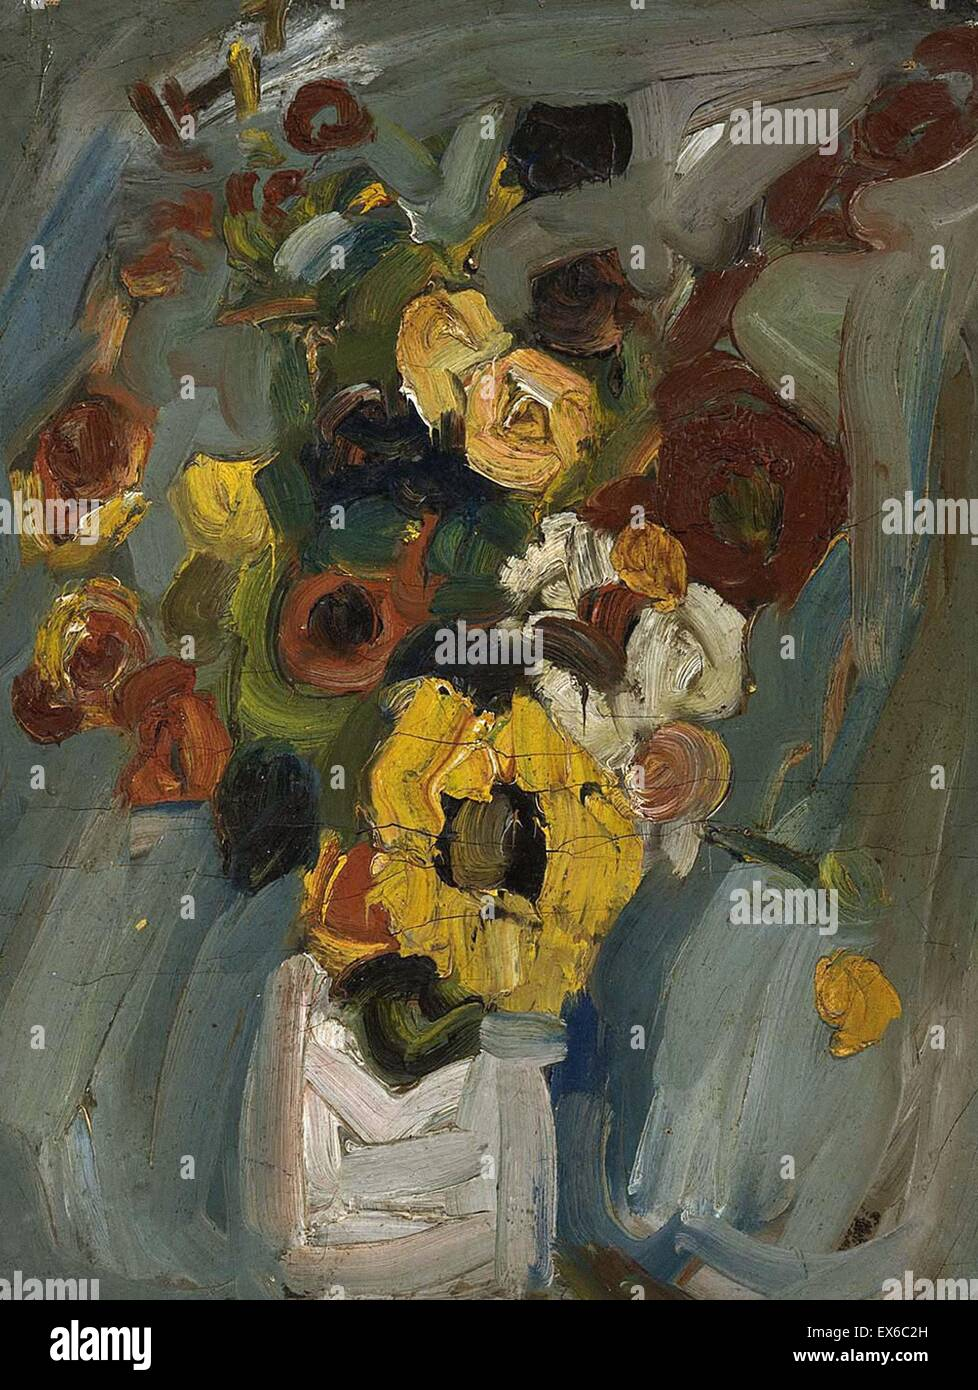 William H. Johnson Still Life - Flores Imagen De Stock